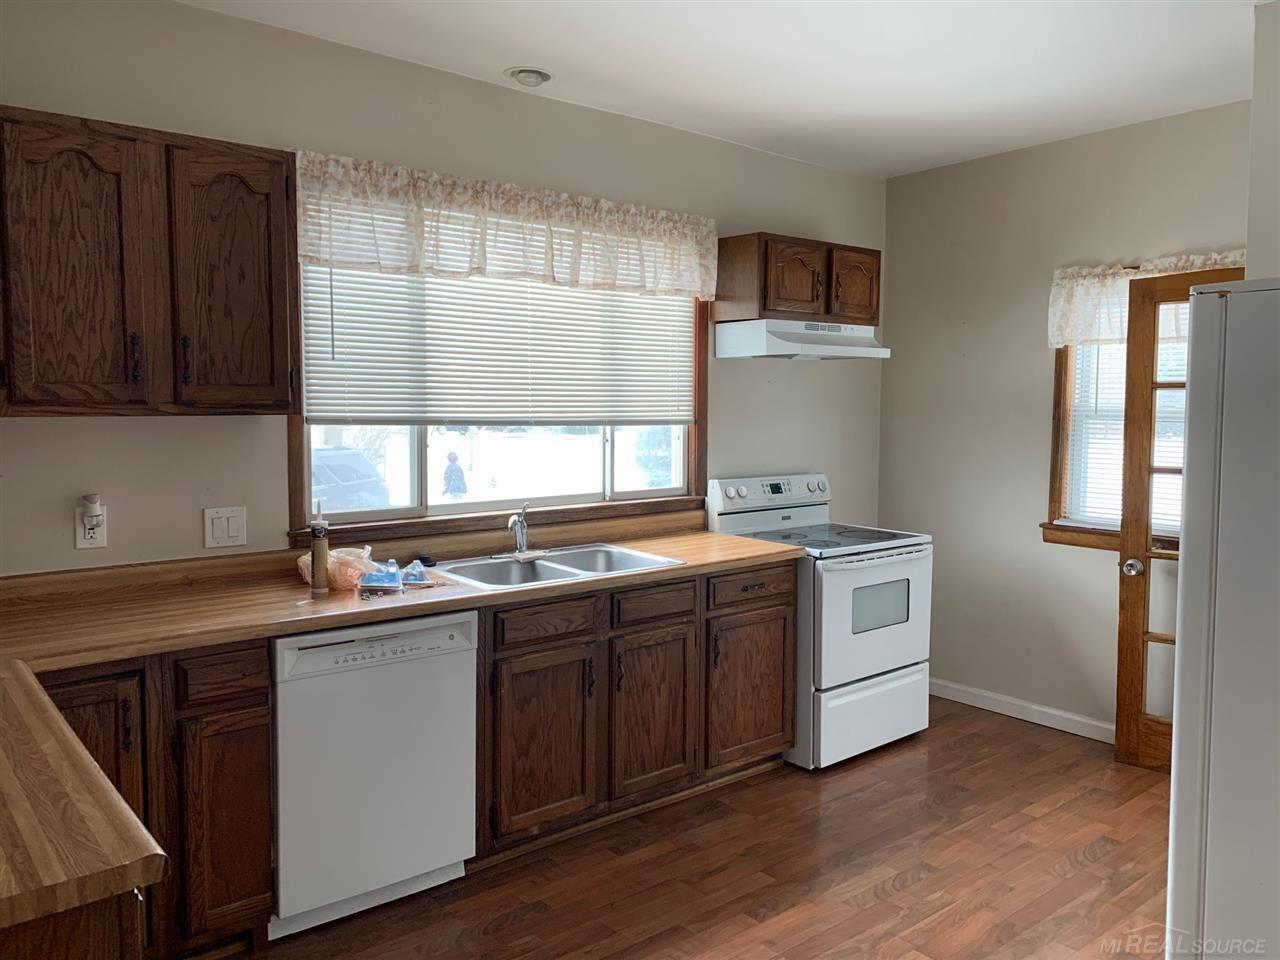 Photo of 2175 Auburn, Rochester Hills, MI 48309 (MLS # 50005558)